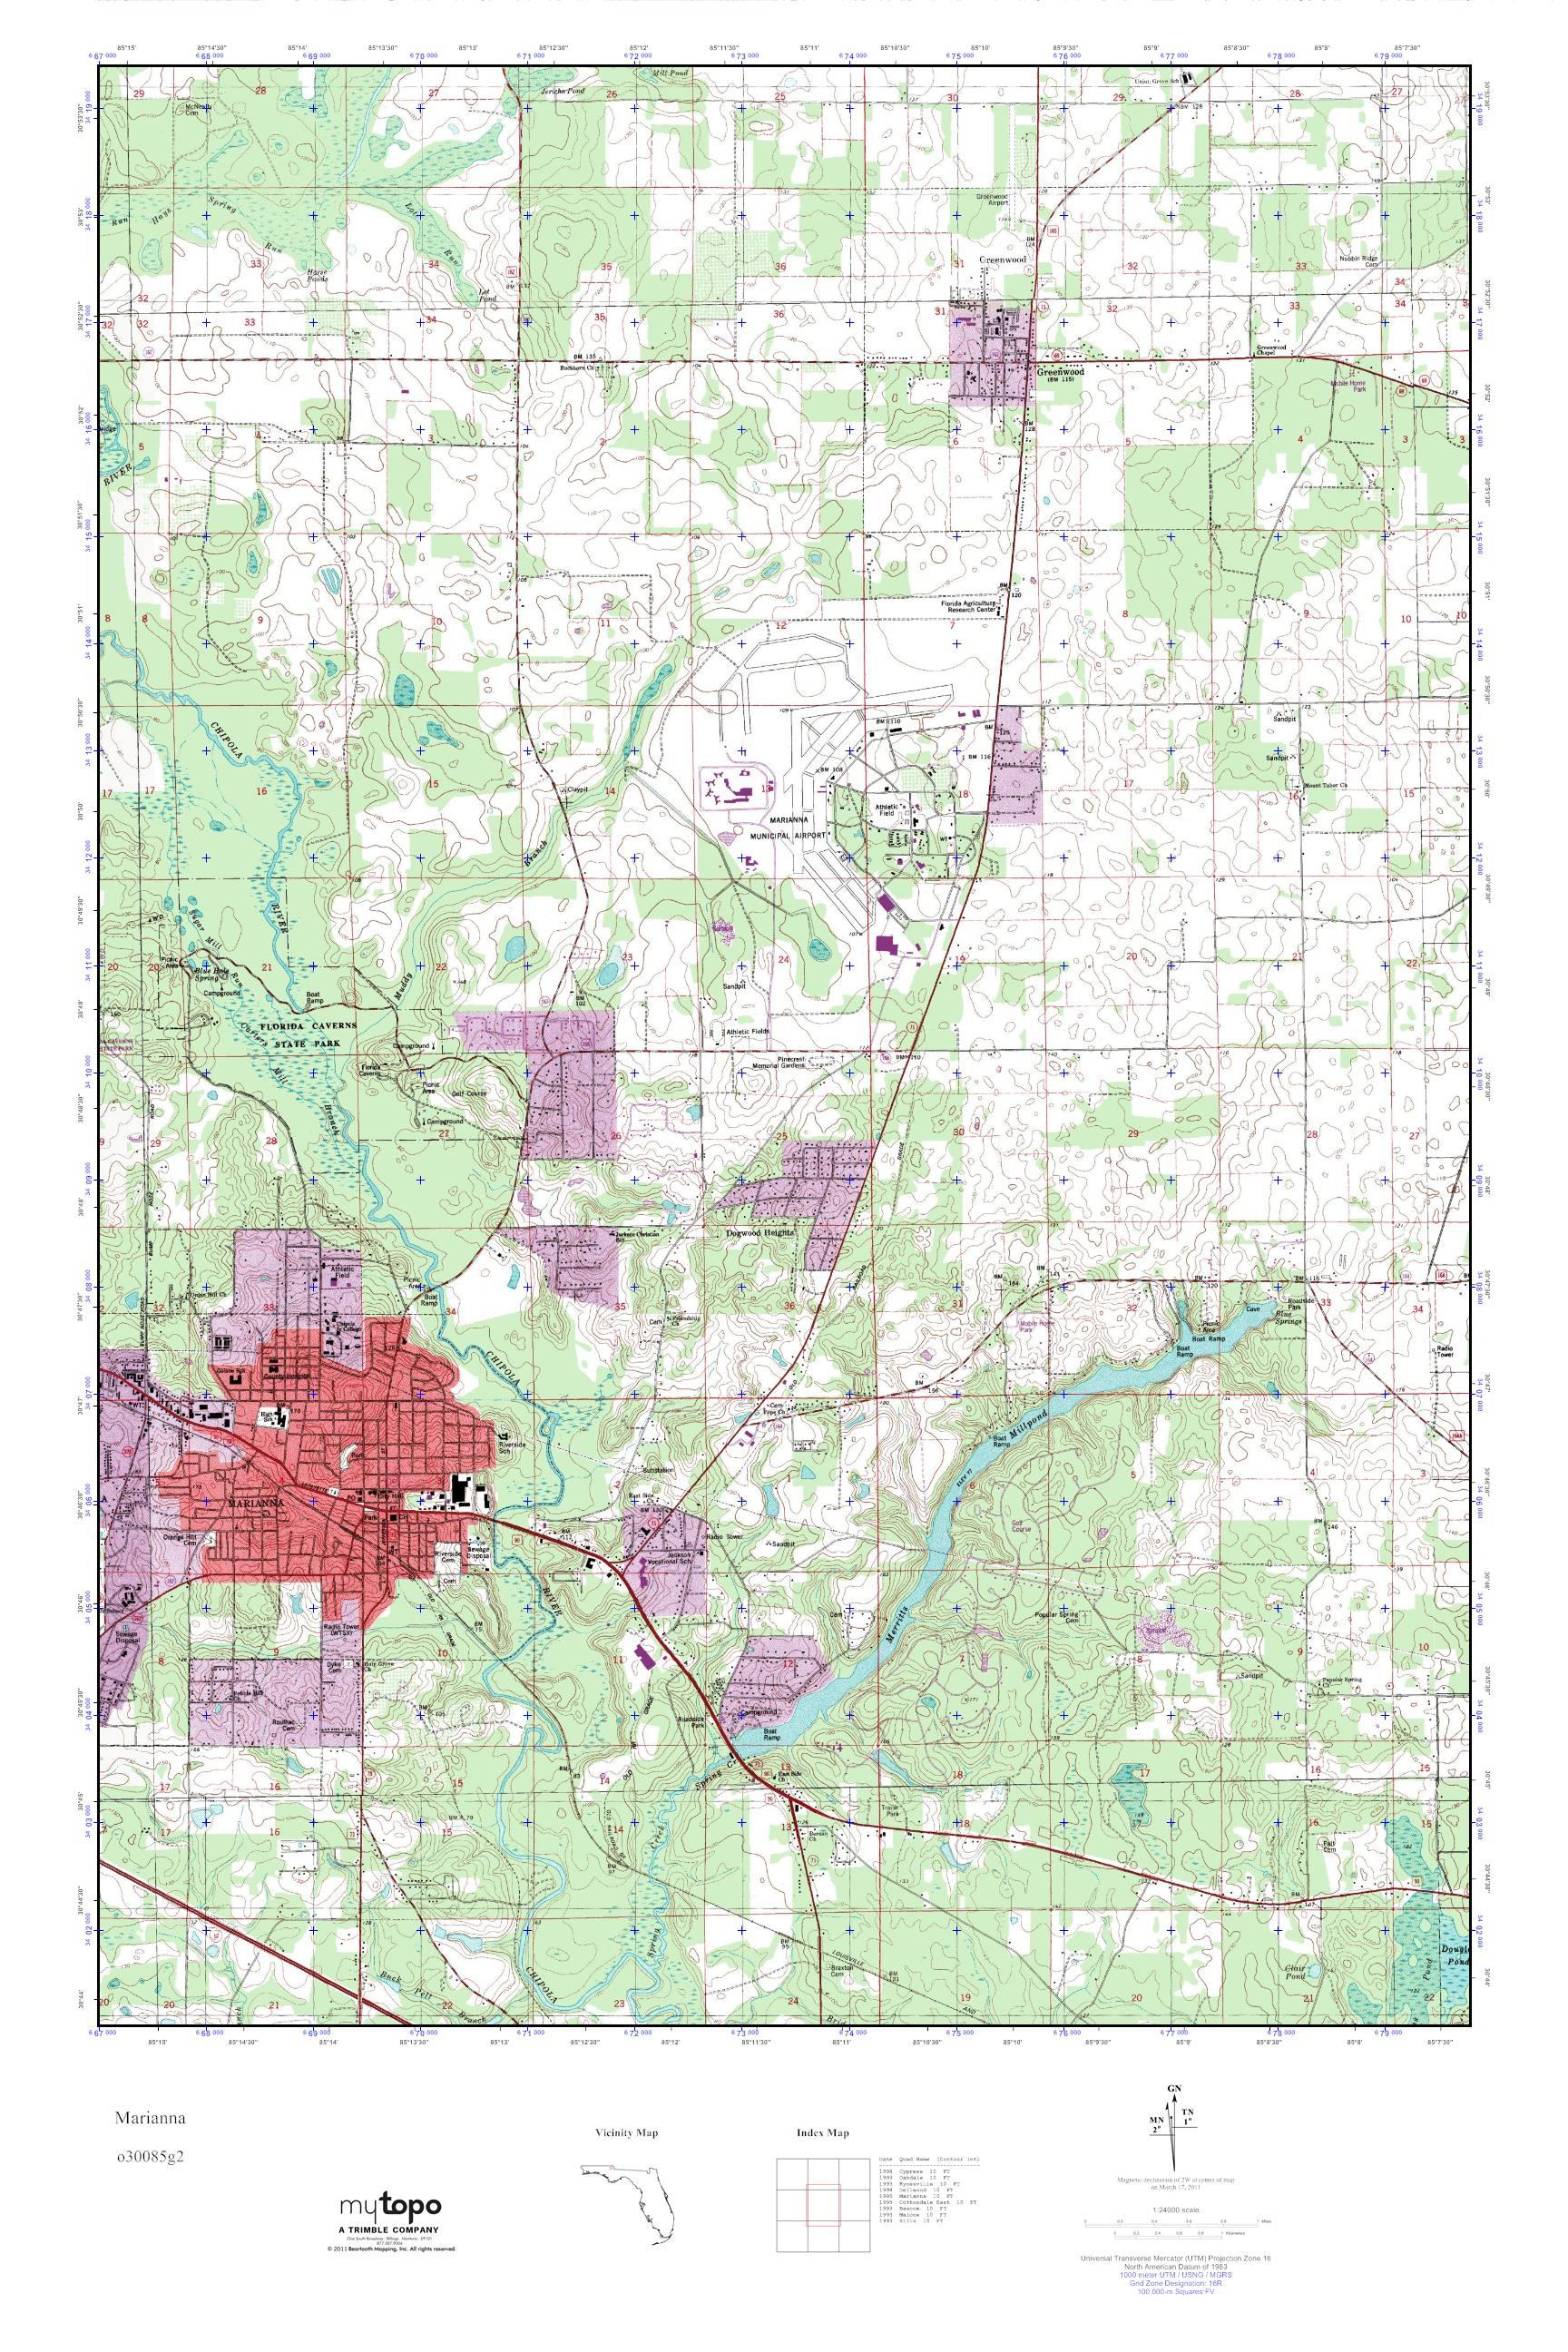 Mytopo Marianna Florida Usgs Quad Topo Map